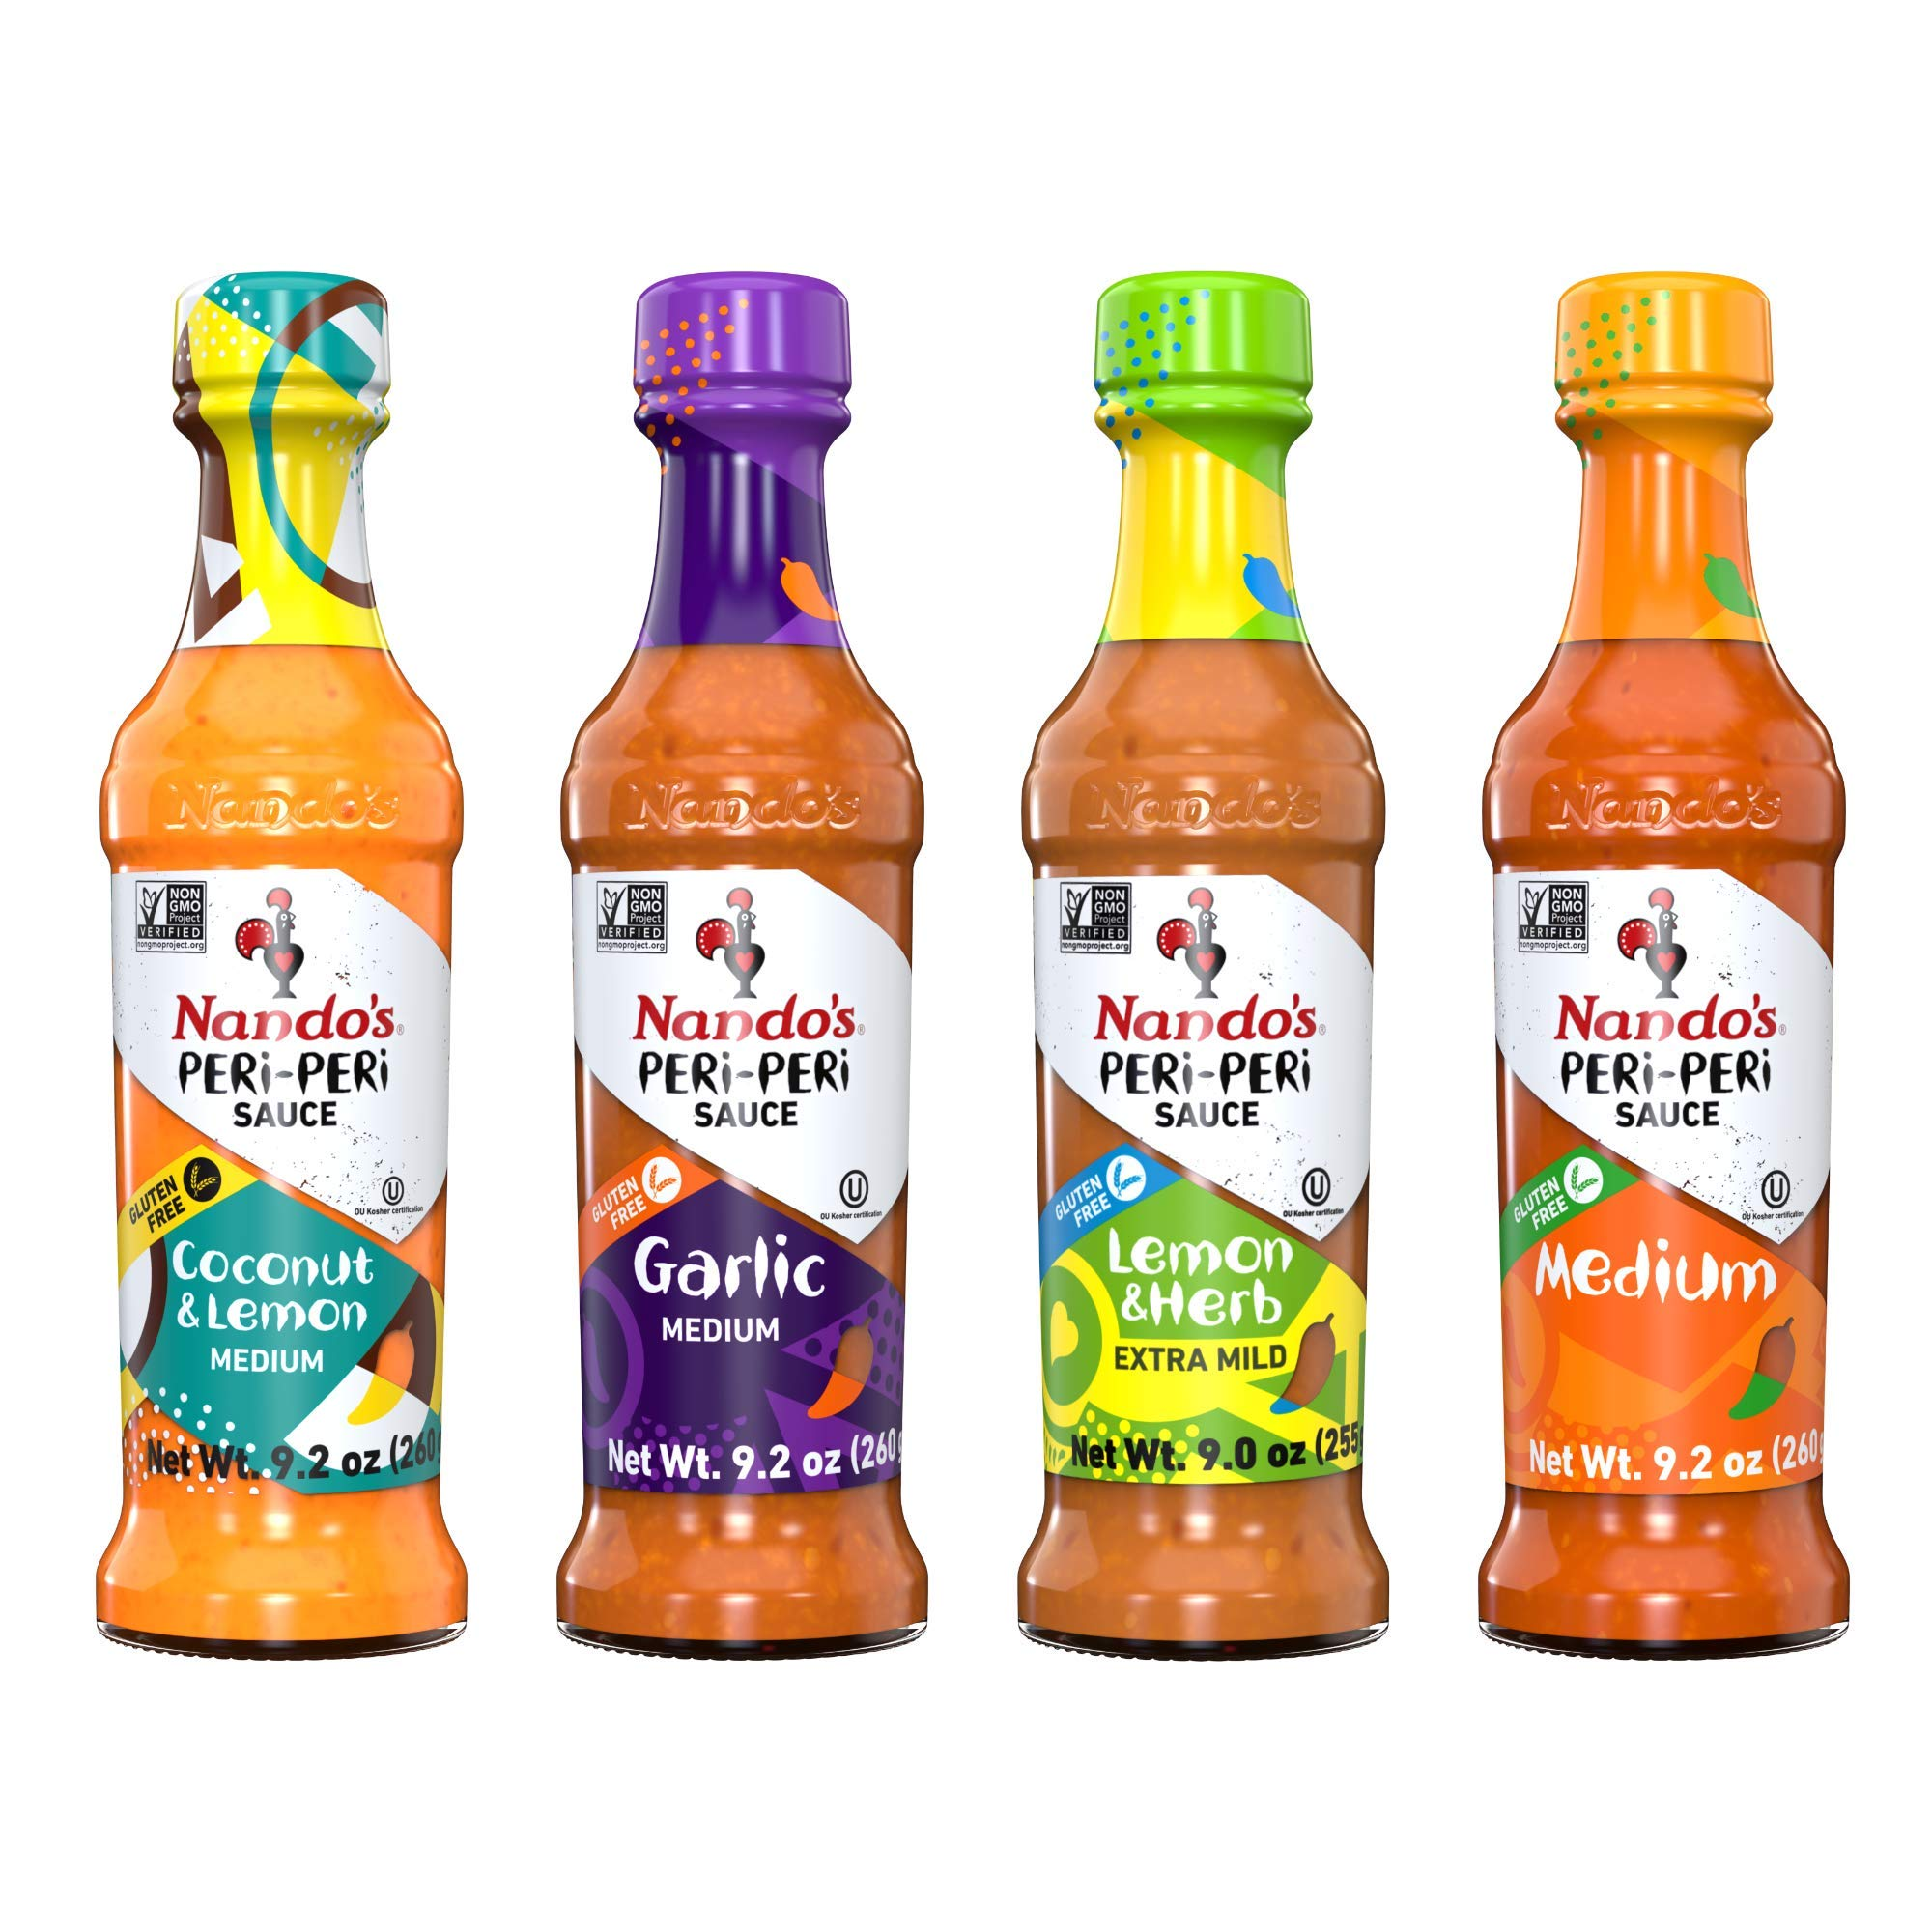 Nando's PERi PERi Hot Sauce Foodies Flavor Pack - Coconut Lemon, Lemon & Herb, Garlic, Medium - 9.1oz Bottles, 4PK